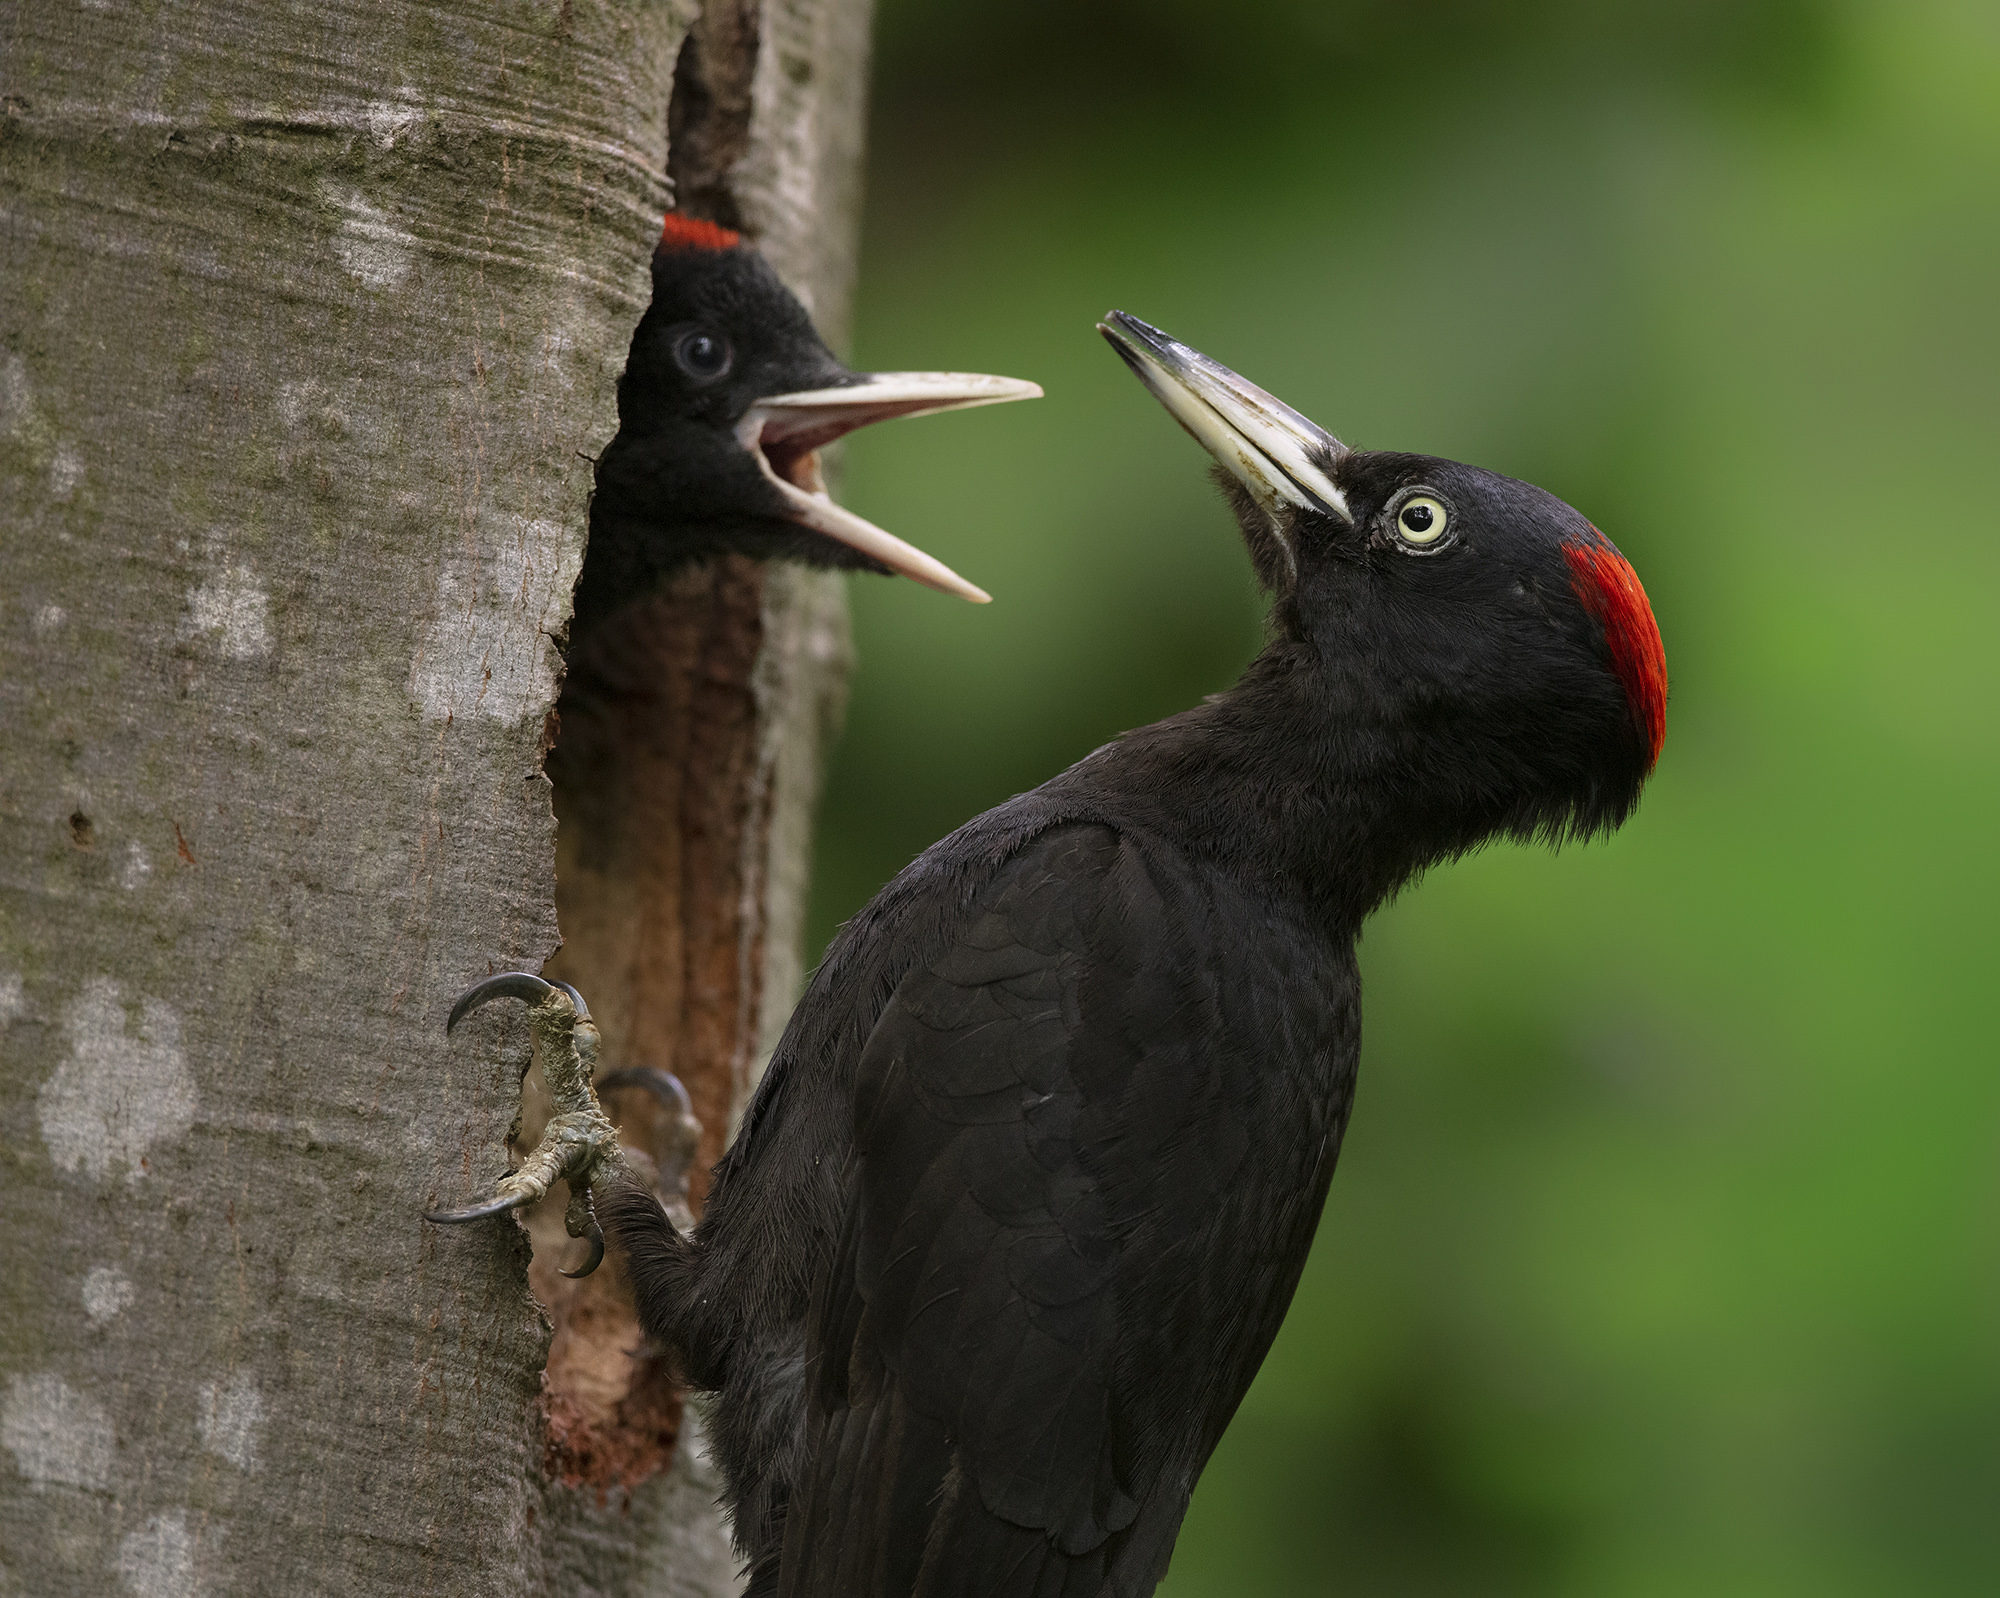 Fekete harkály, Black Woodpecker, Schwarzspecht, Dryocopus martius